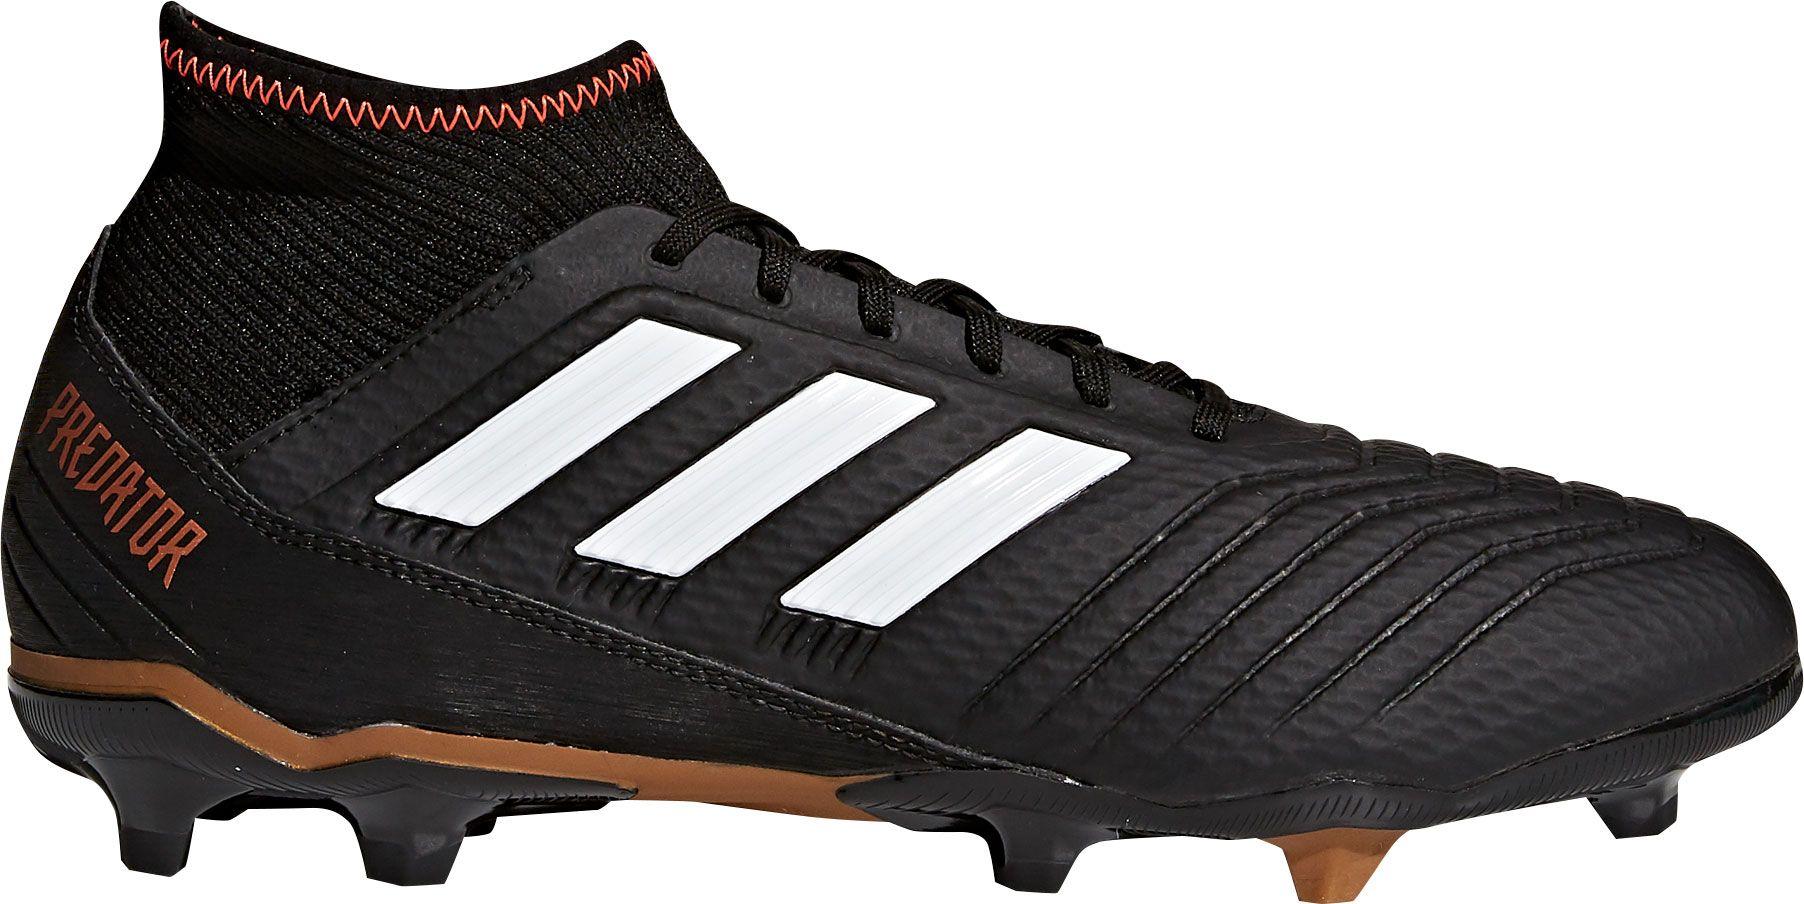 discount get authentic ADIDAS Men's Predator 18.3 Firm Ground Soccer Cleats geniue stockist sale shop for RKLiTKc